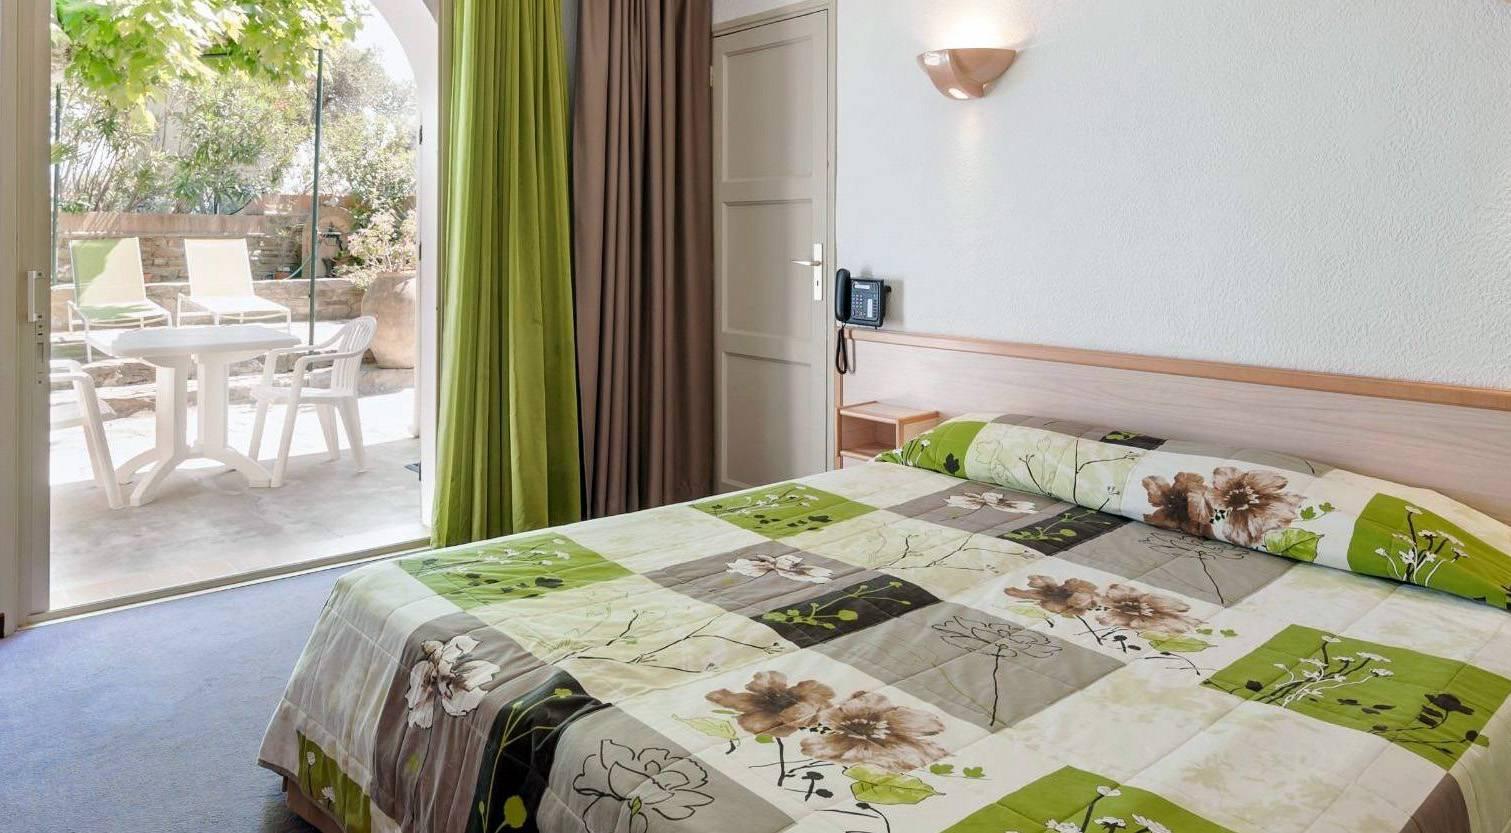 h tel en bord de mer hy res lido beach hotel france sud h tel de la c te d 39 azur dans le. Black Bedroom Furniture Sets. Home Design Ideas